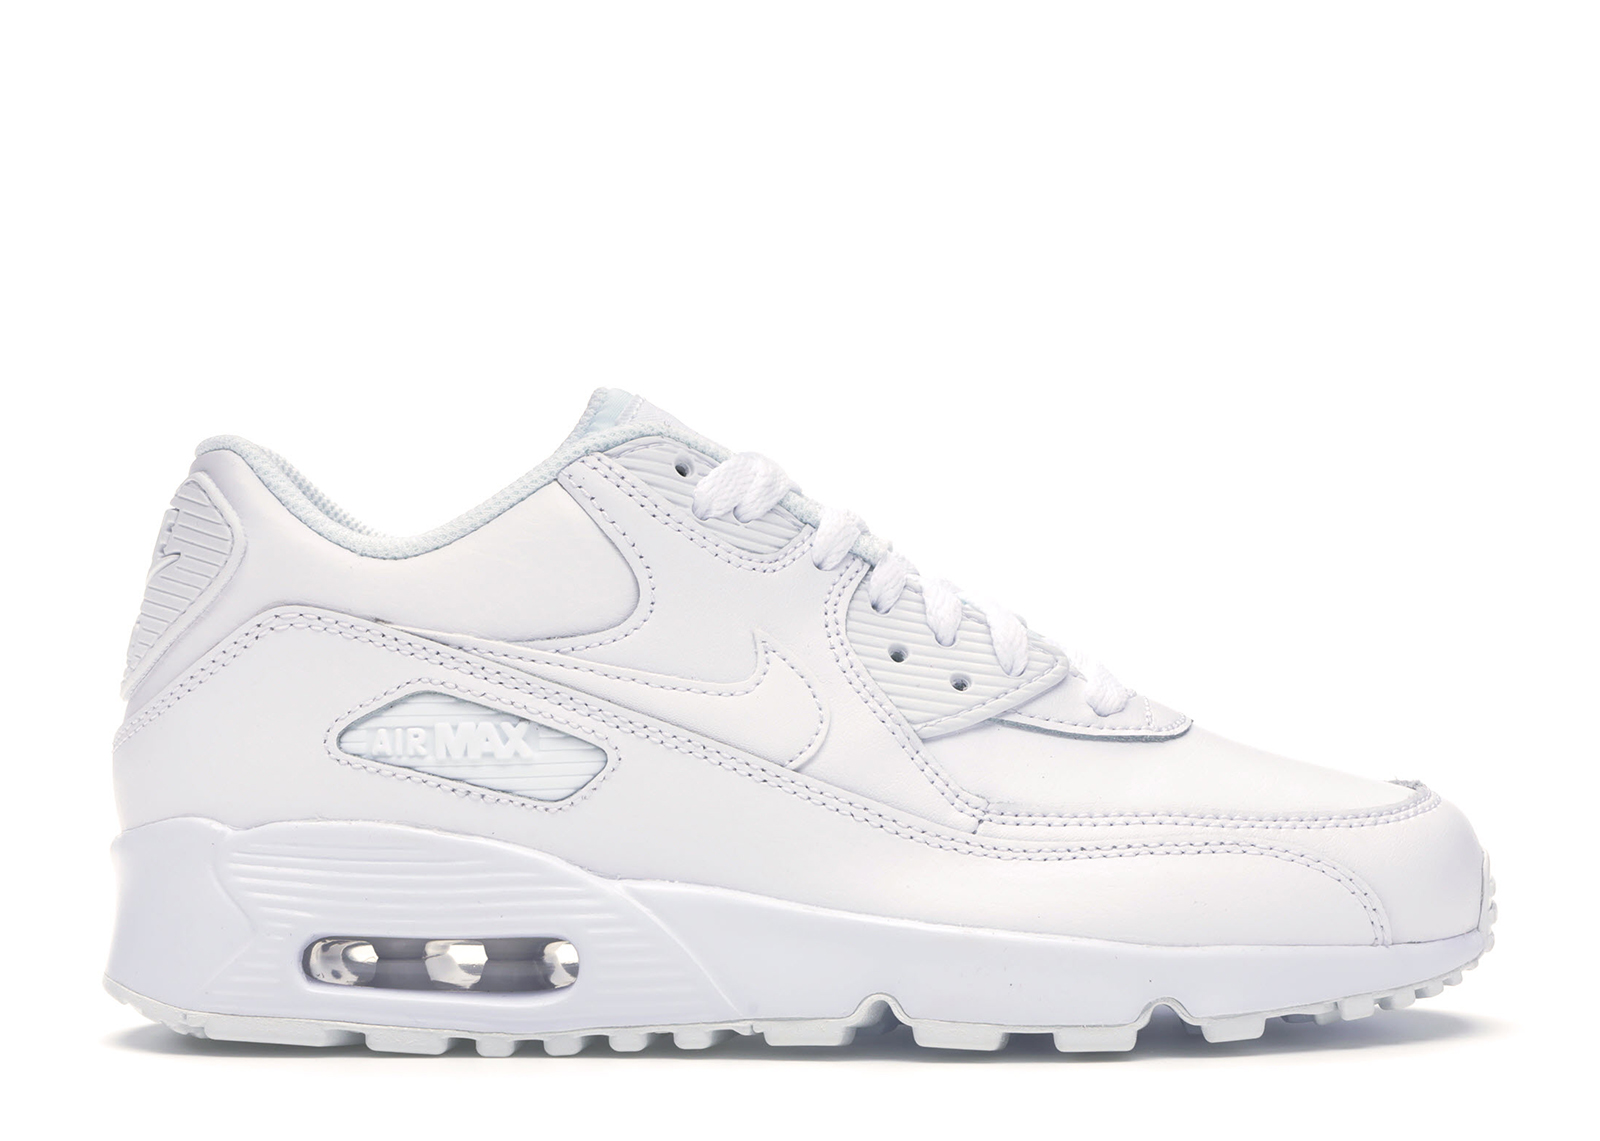 Nike Air Max 90 White Leather (GS) - 833412-100